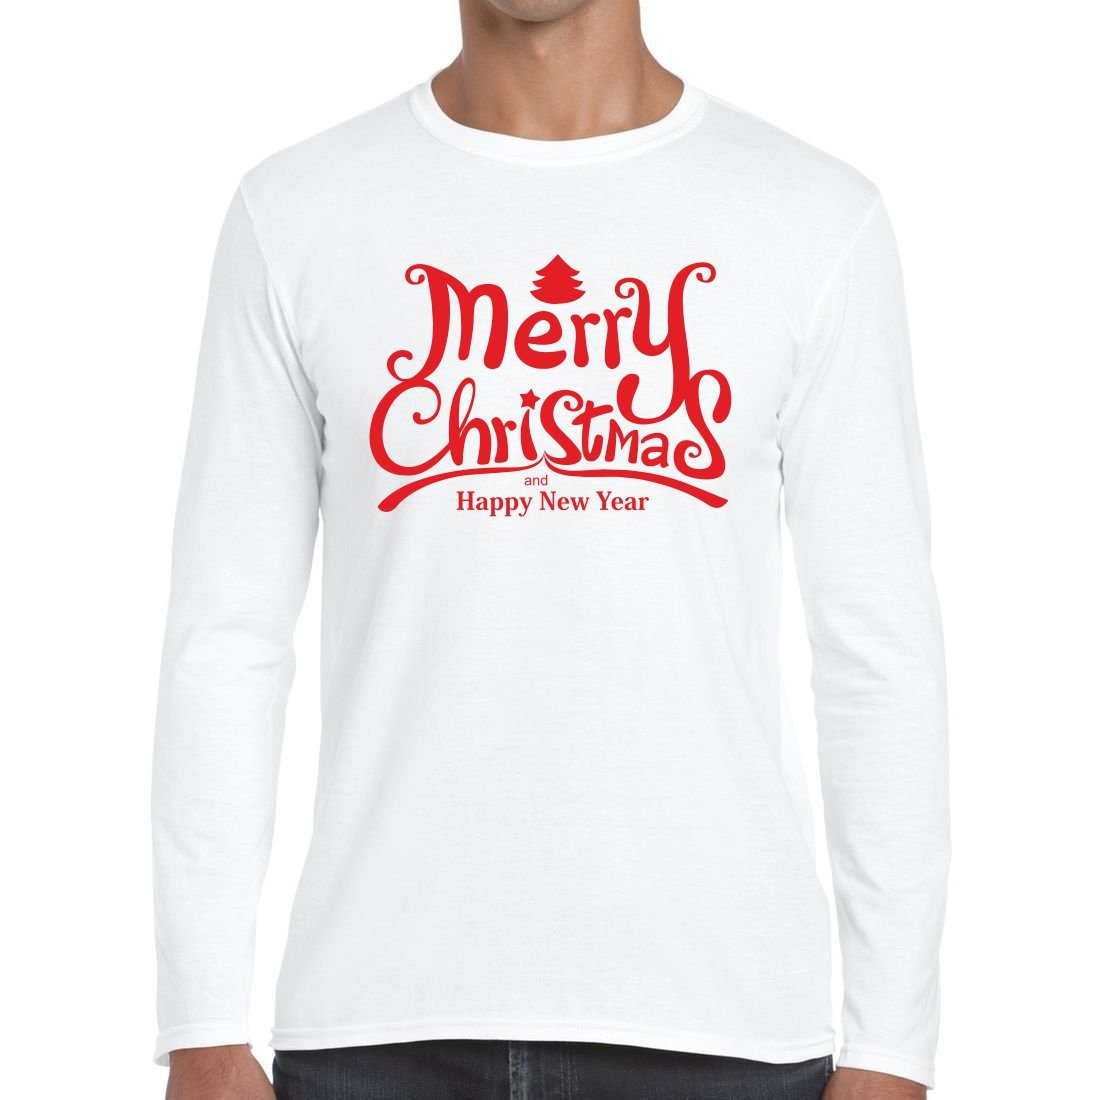 Merry Christmas and Happy New Year T Shirt Long Sleeve T-Shirt Tee:  Amazon.co.uk: Clothing